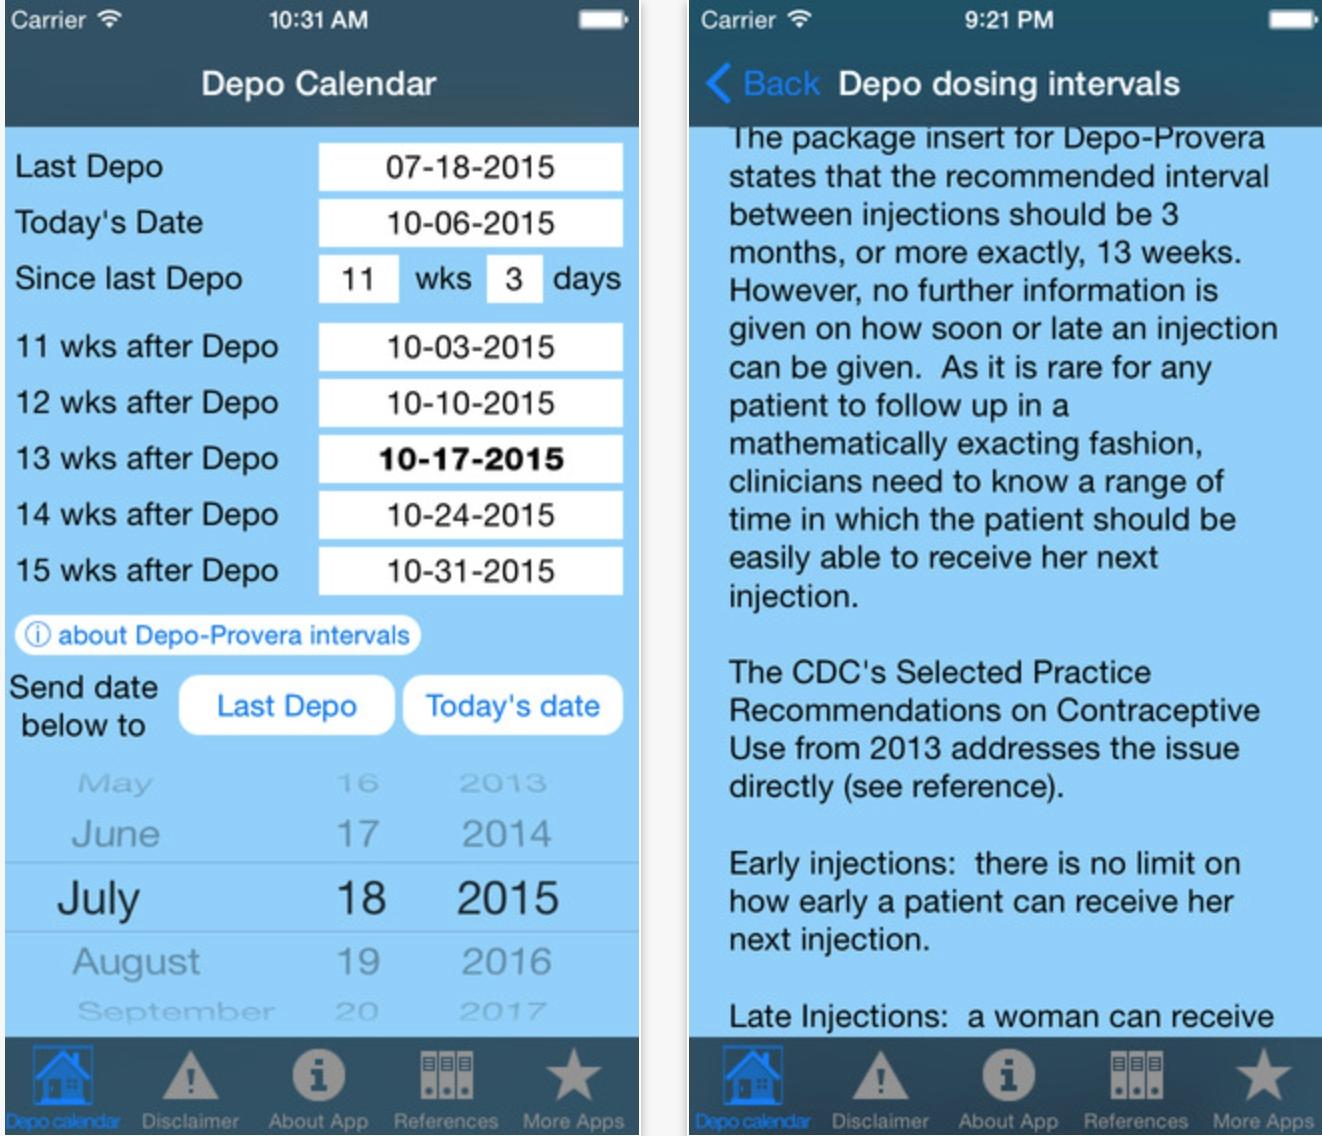 Depo Calendar App Could Significantly Improve Contraception  Dep Provera Calendar